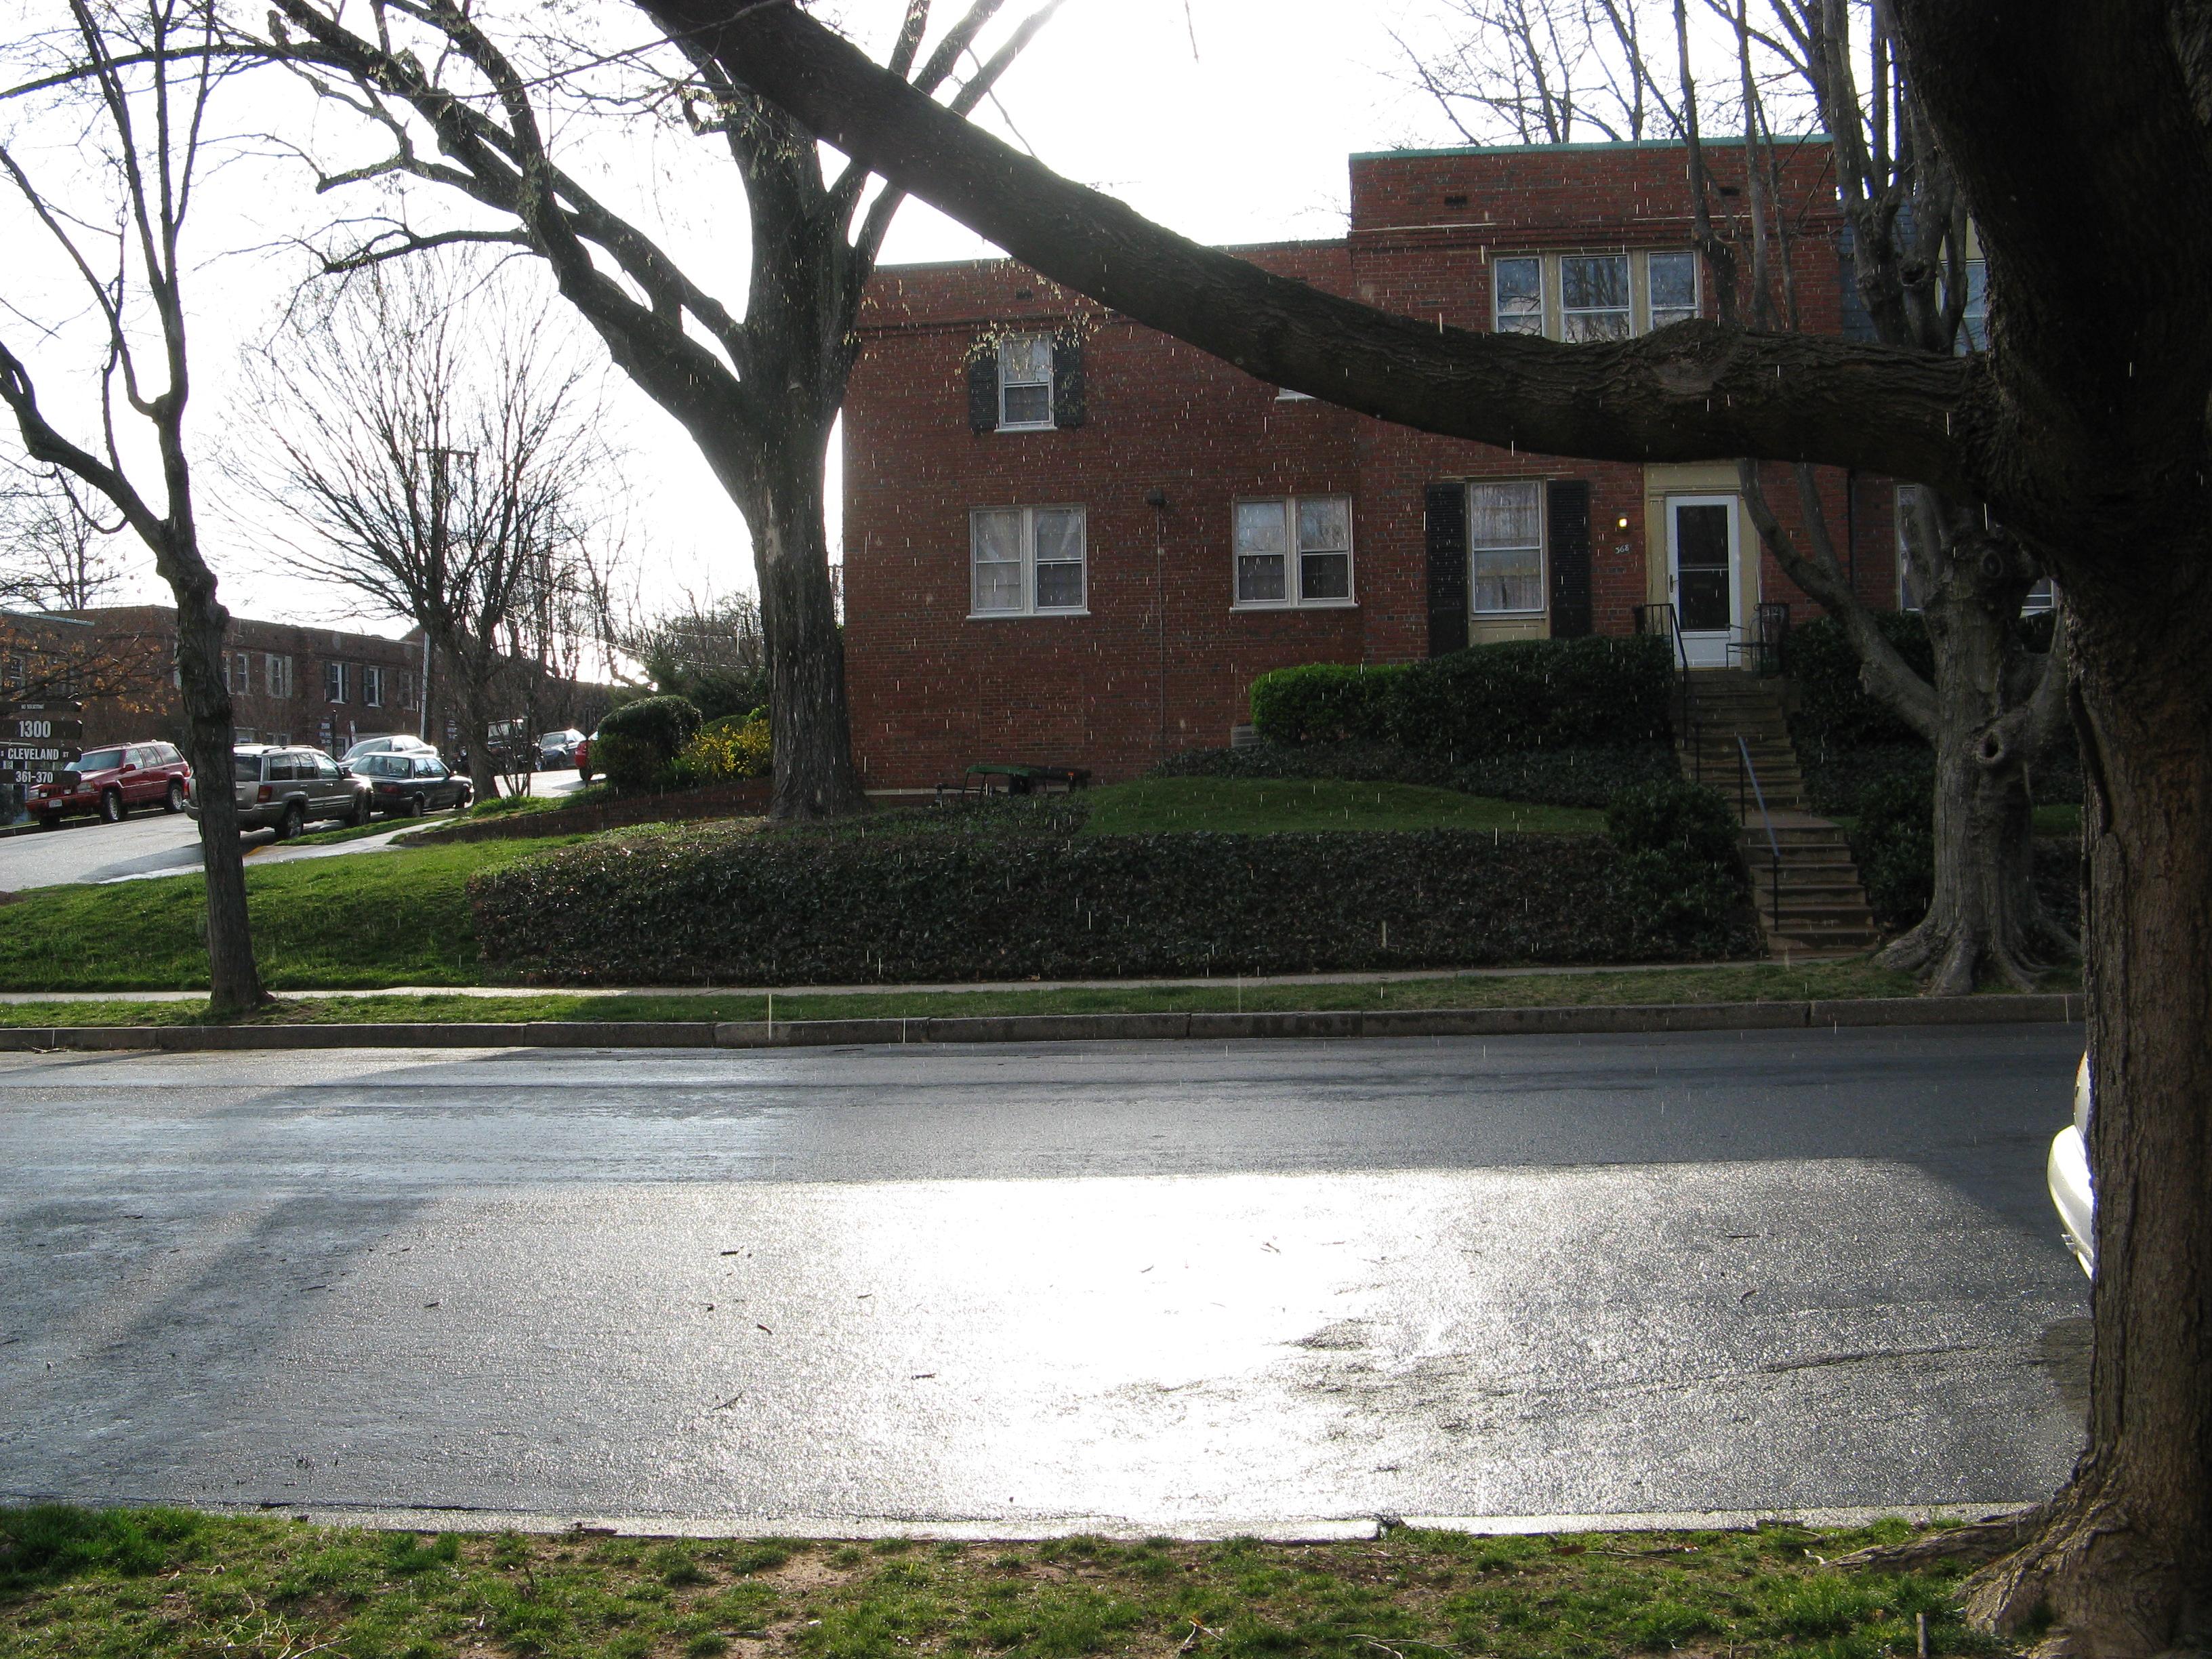 Arlington Village Historic District (Arlington, Virginiaarlington village